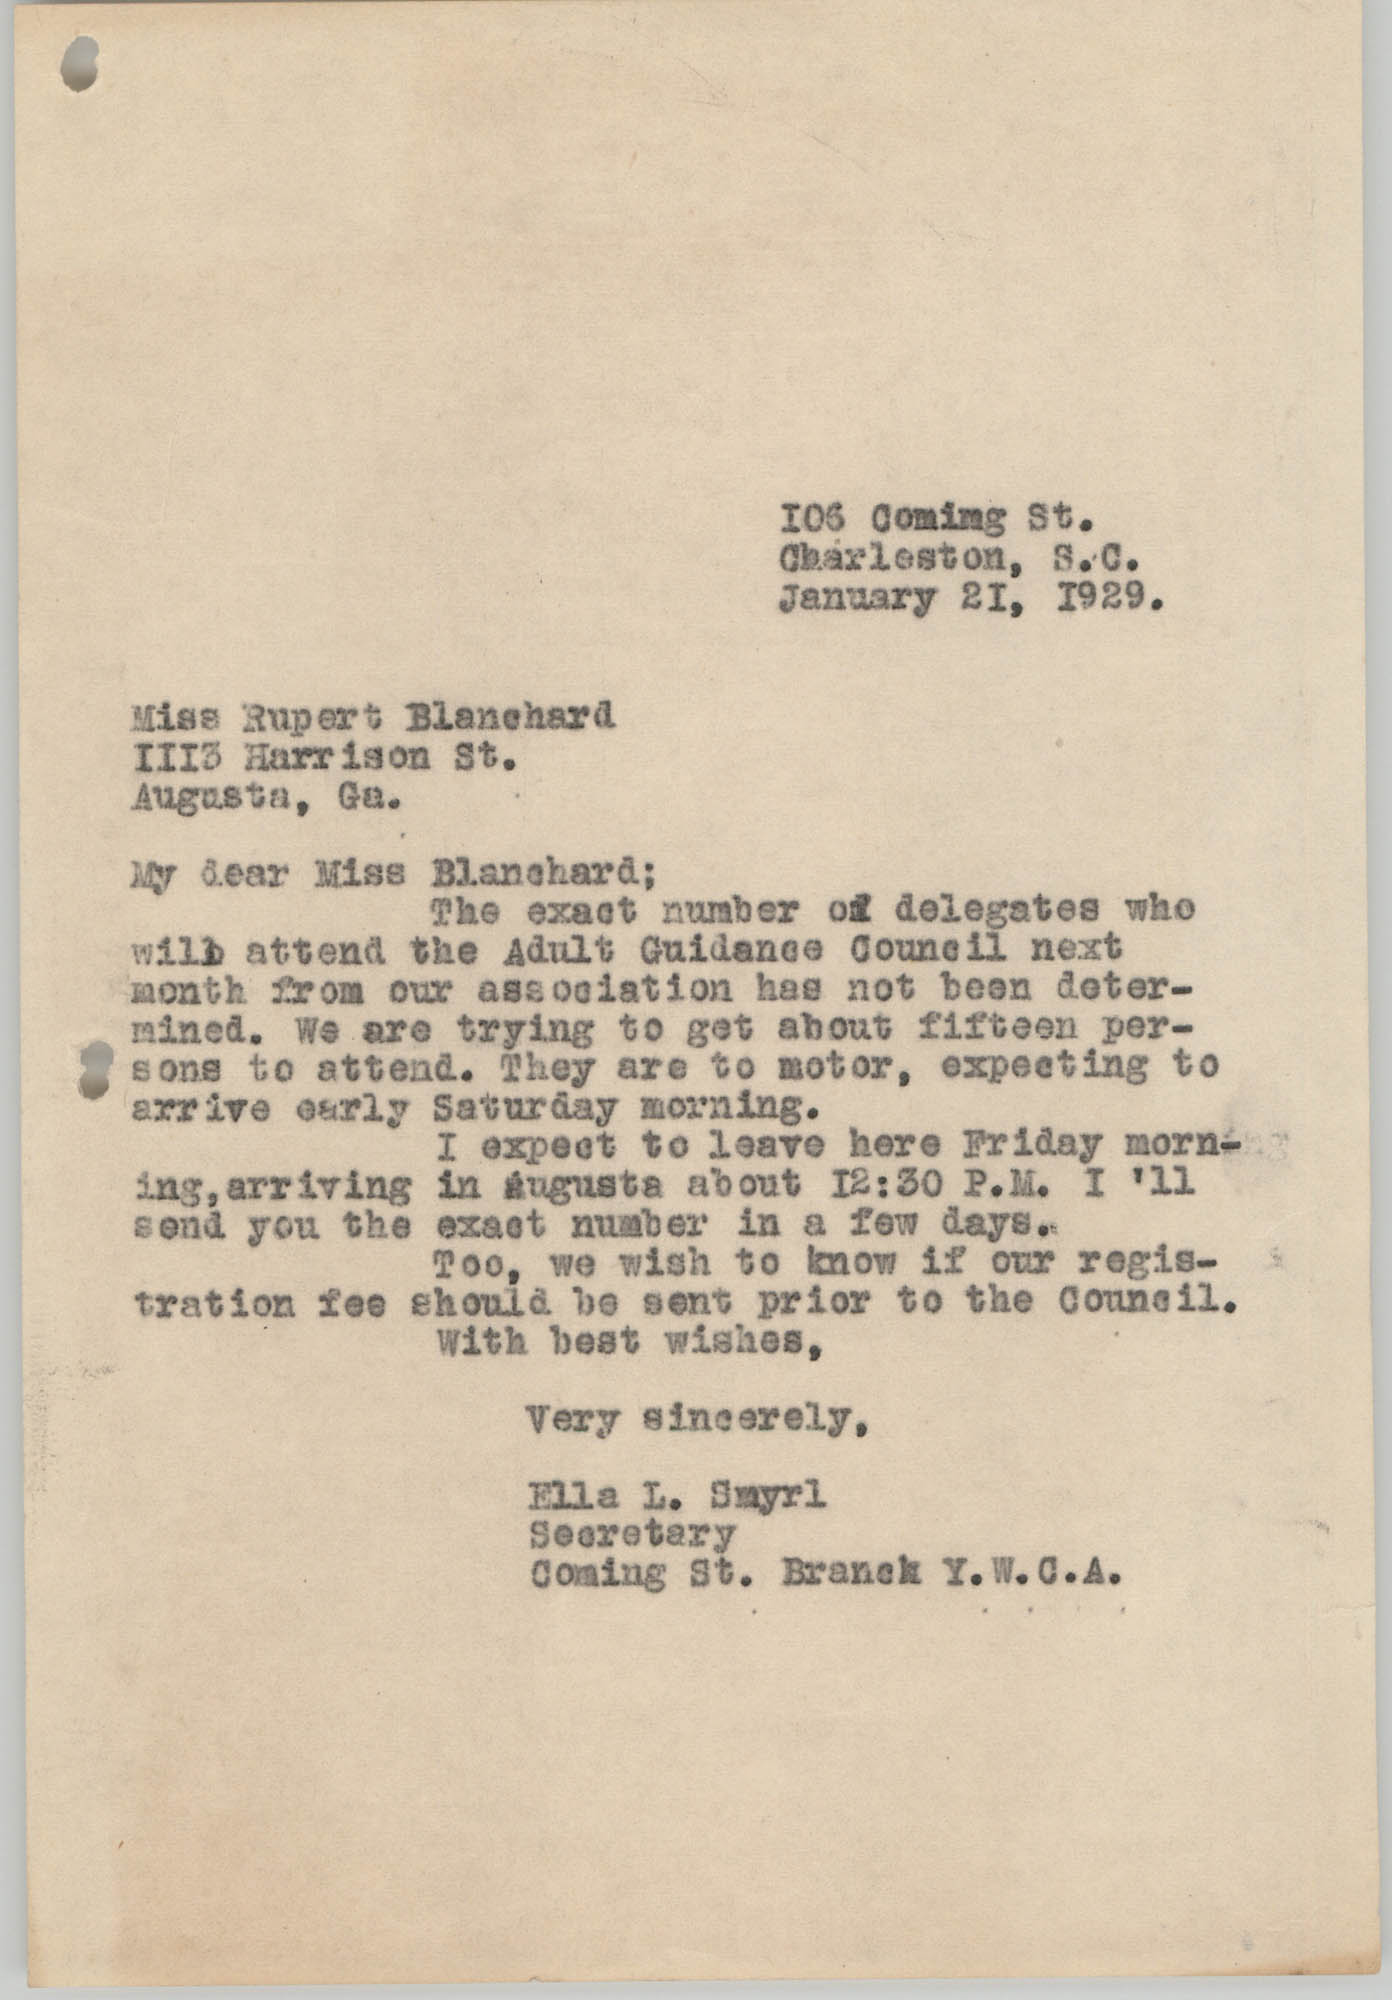 Letter from Ella L. Smyrl to Rupert Blanchard, January 21, 1929